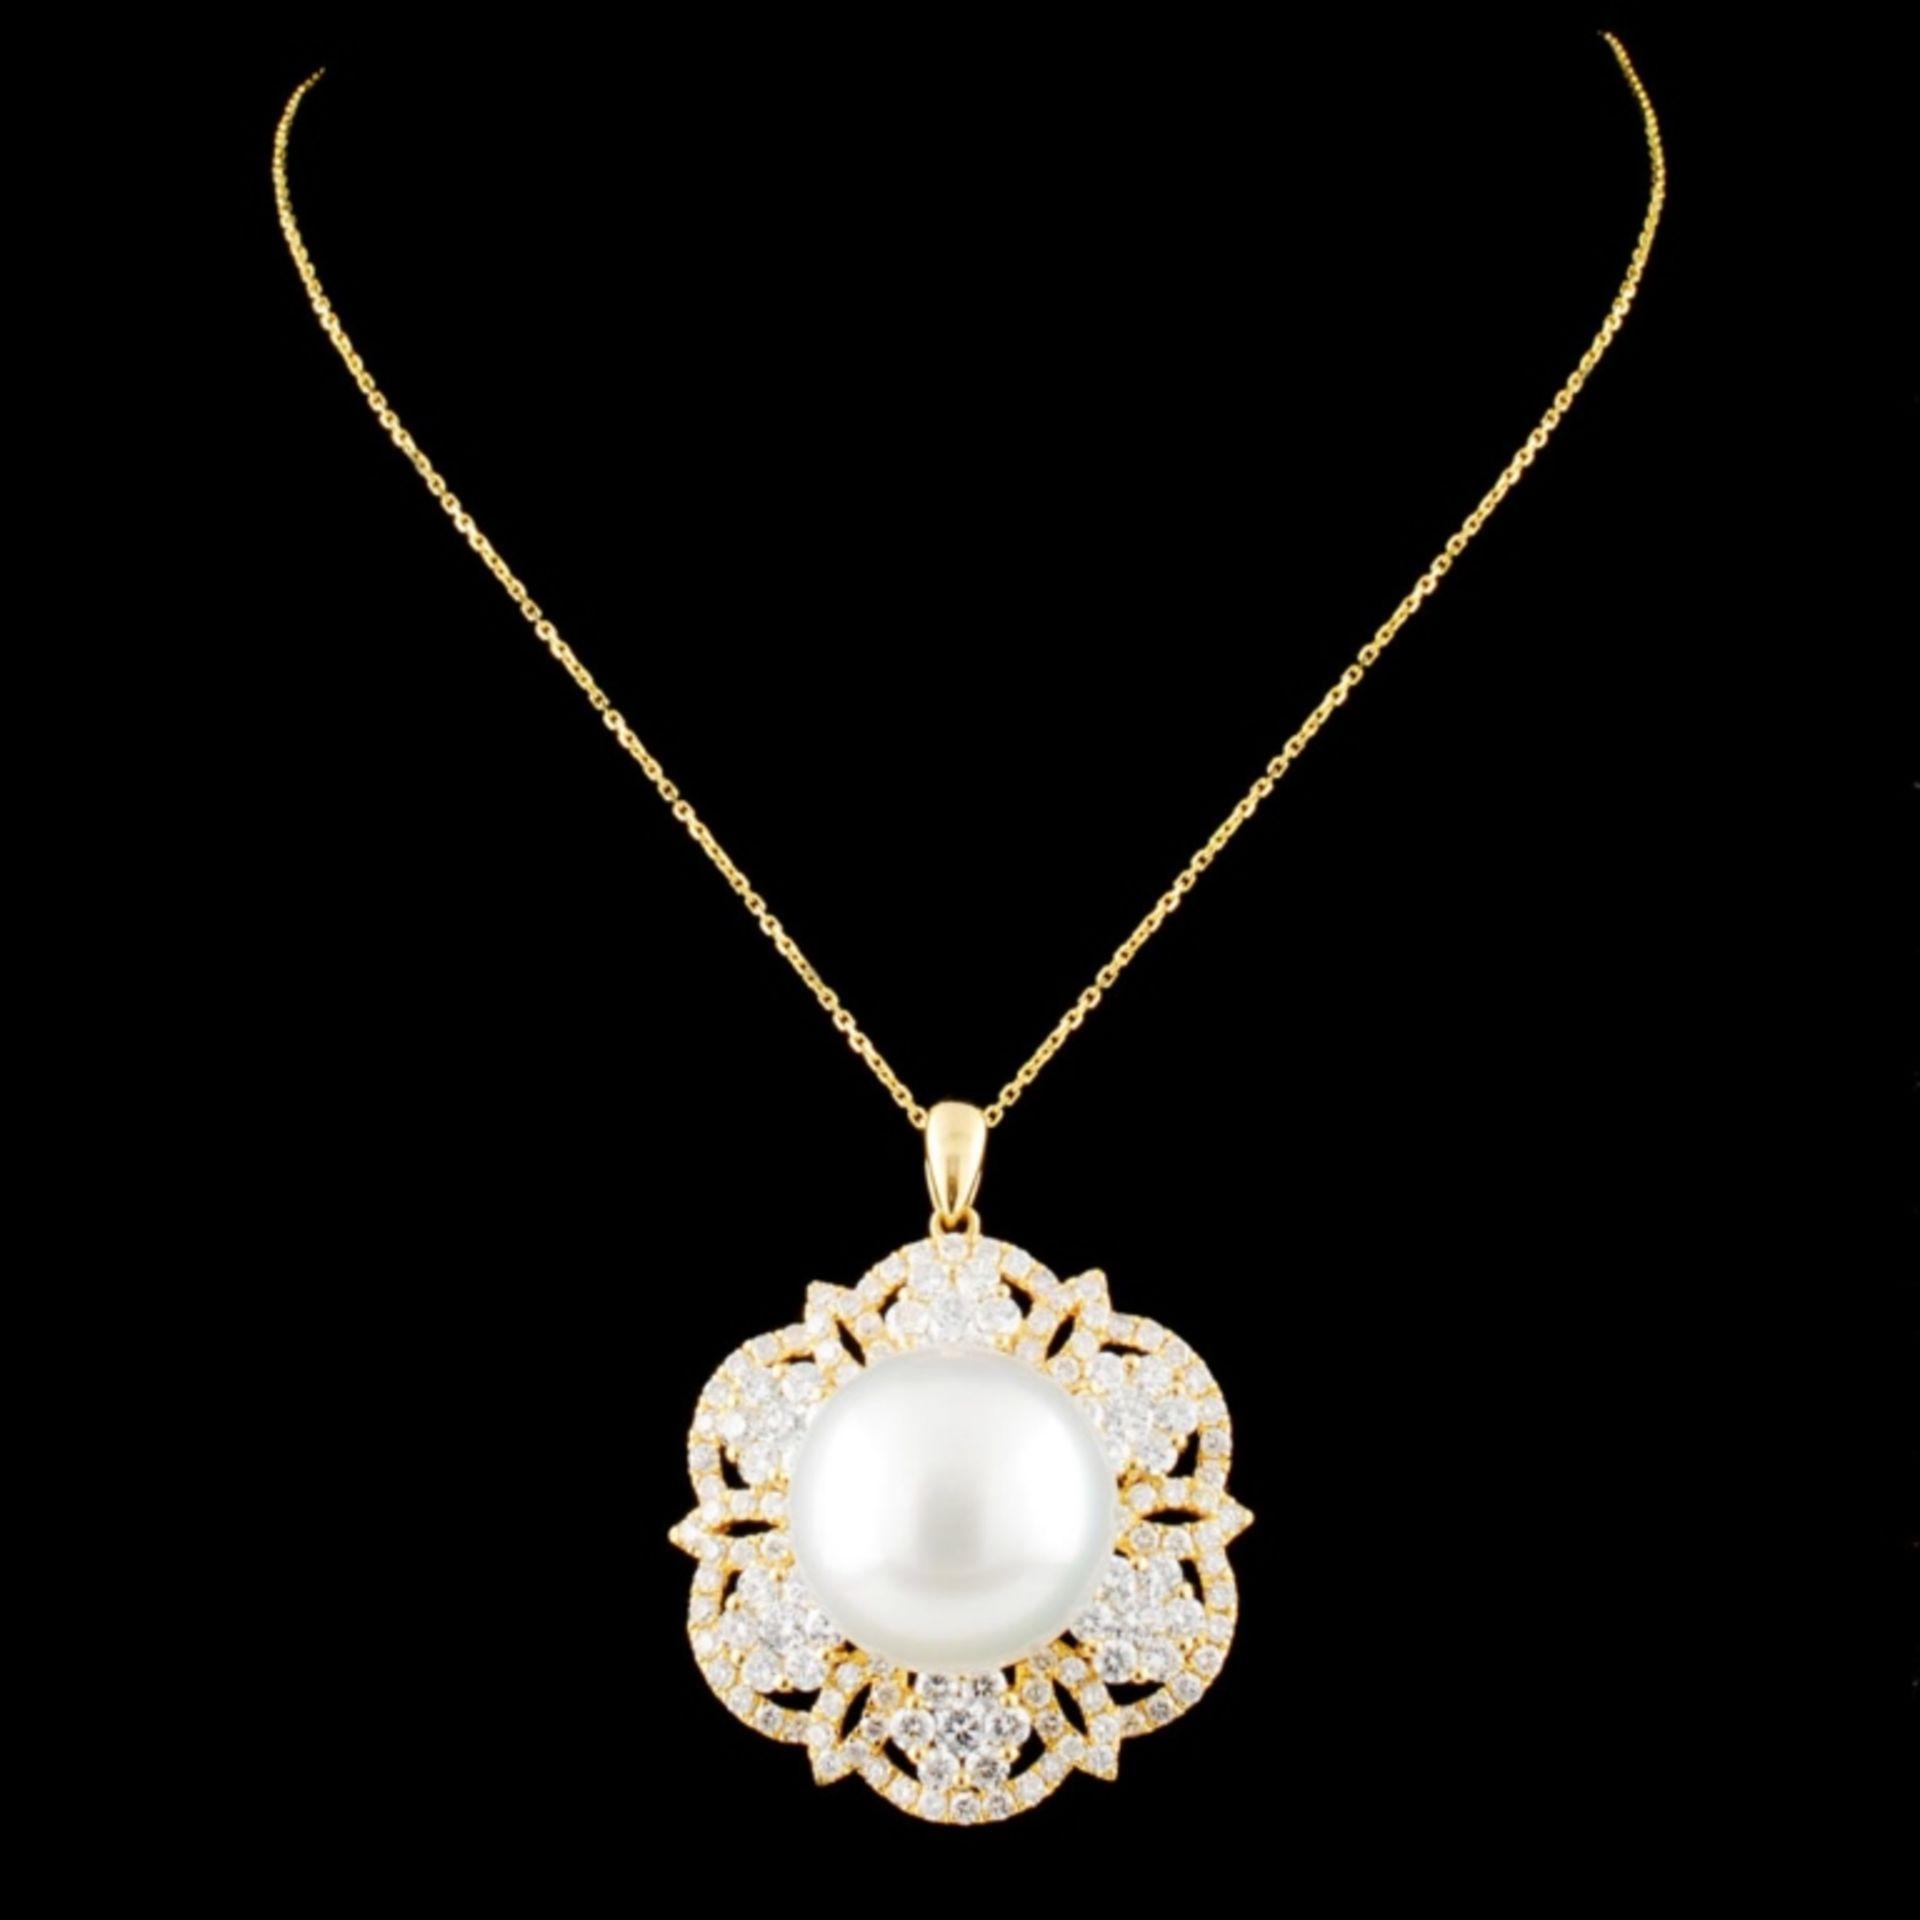 18K Gold 14.00MM Pearl & 2.26ctw Diamond Pendant - Image 2 of 4